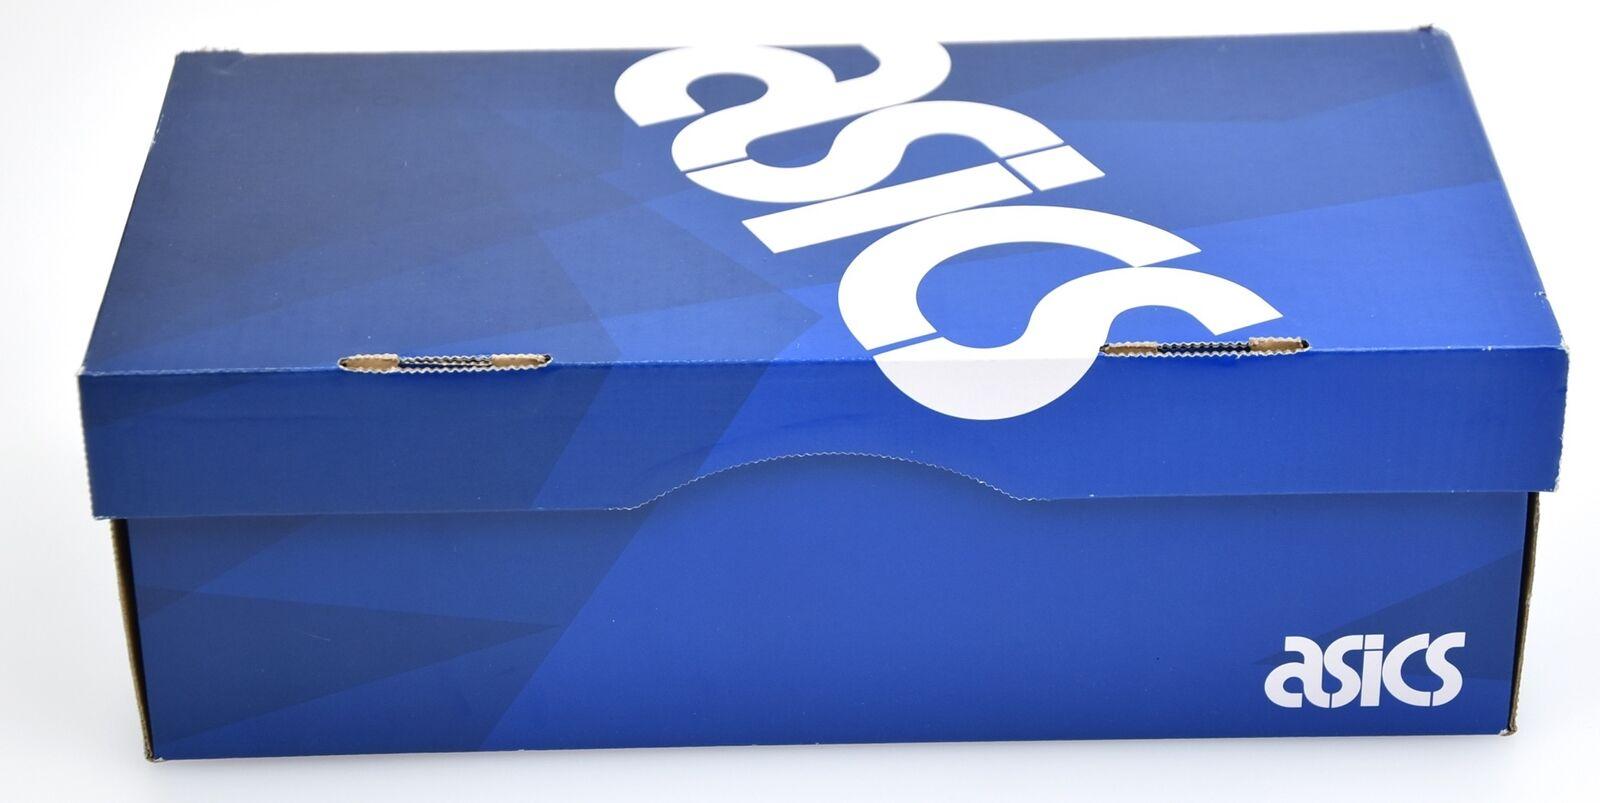 ASICS Damenschuhe Schuhe CASUAL FREE TIME SNEAKER Schuhe Damenschuhe SUEDE CODE H5N8N GEL-LYTE III DEFECT 644027